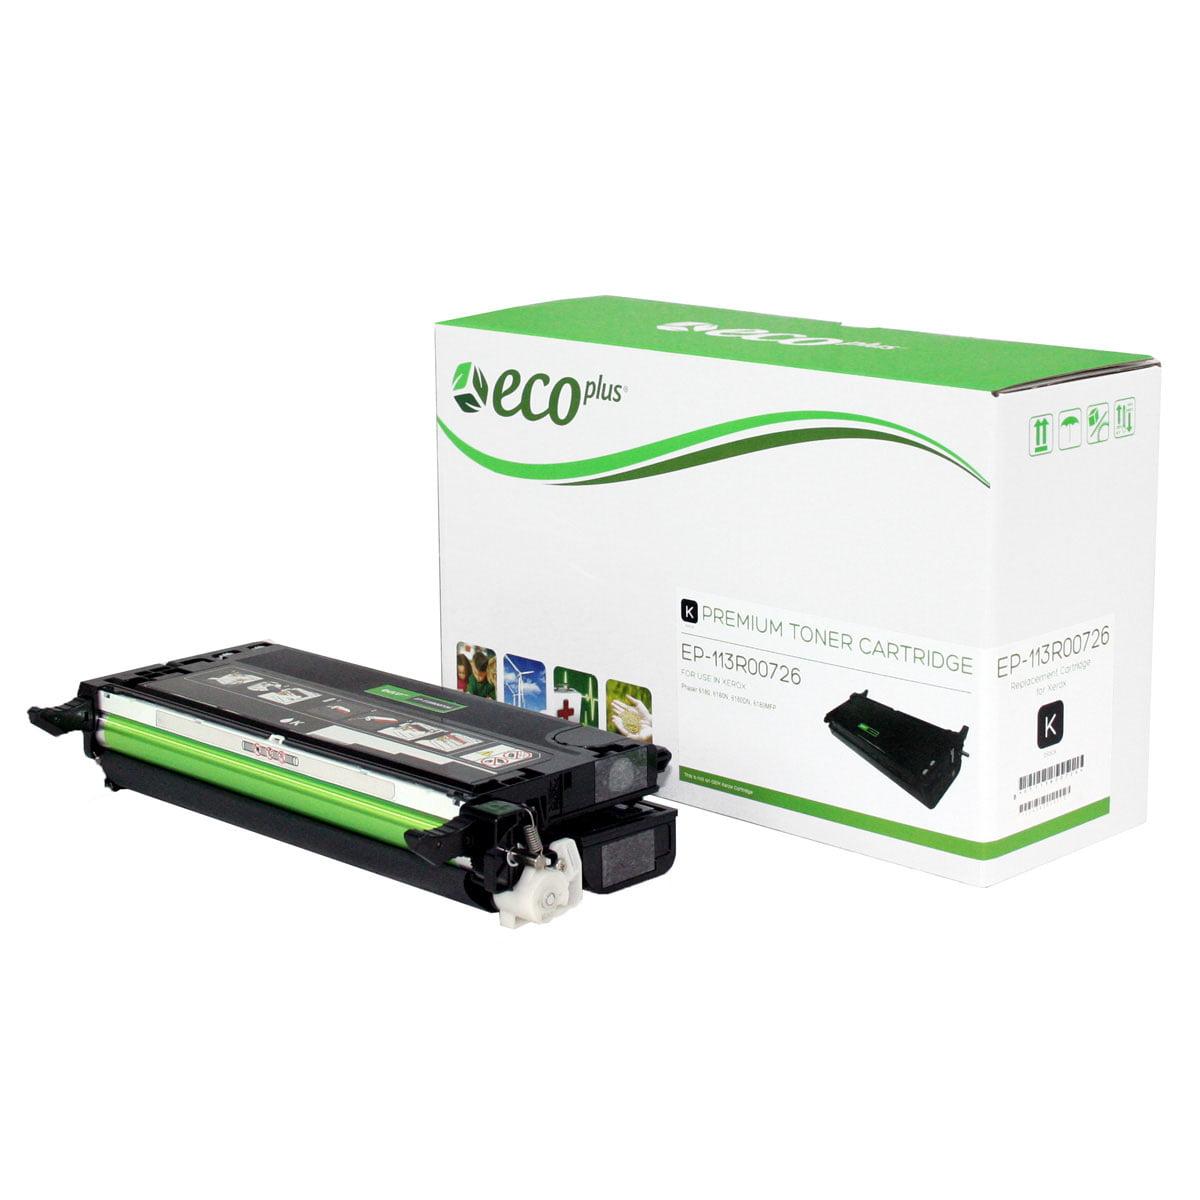 ECOPlus ™ Remanufactured Toner Cartridge for Xerox 113R00726 (Premium Quality TONER CTG, BLACK, 8K YIELD)